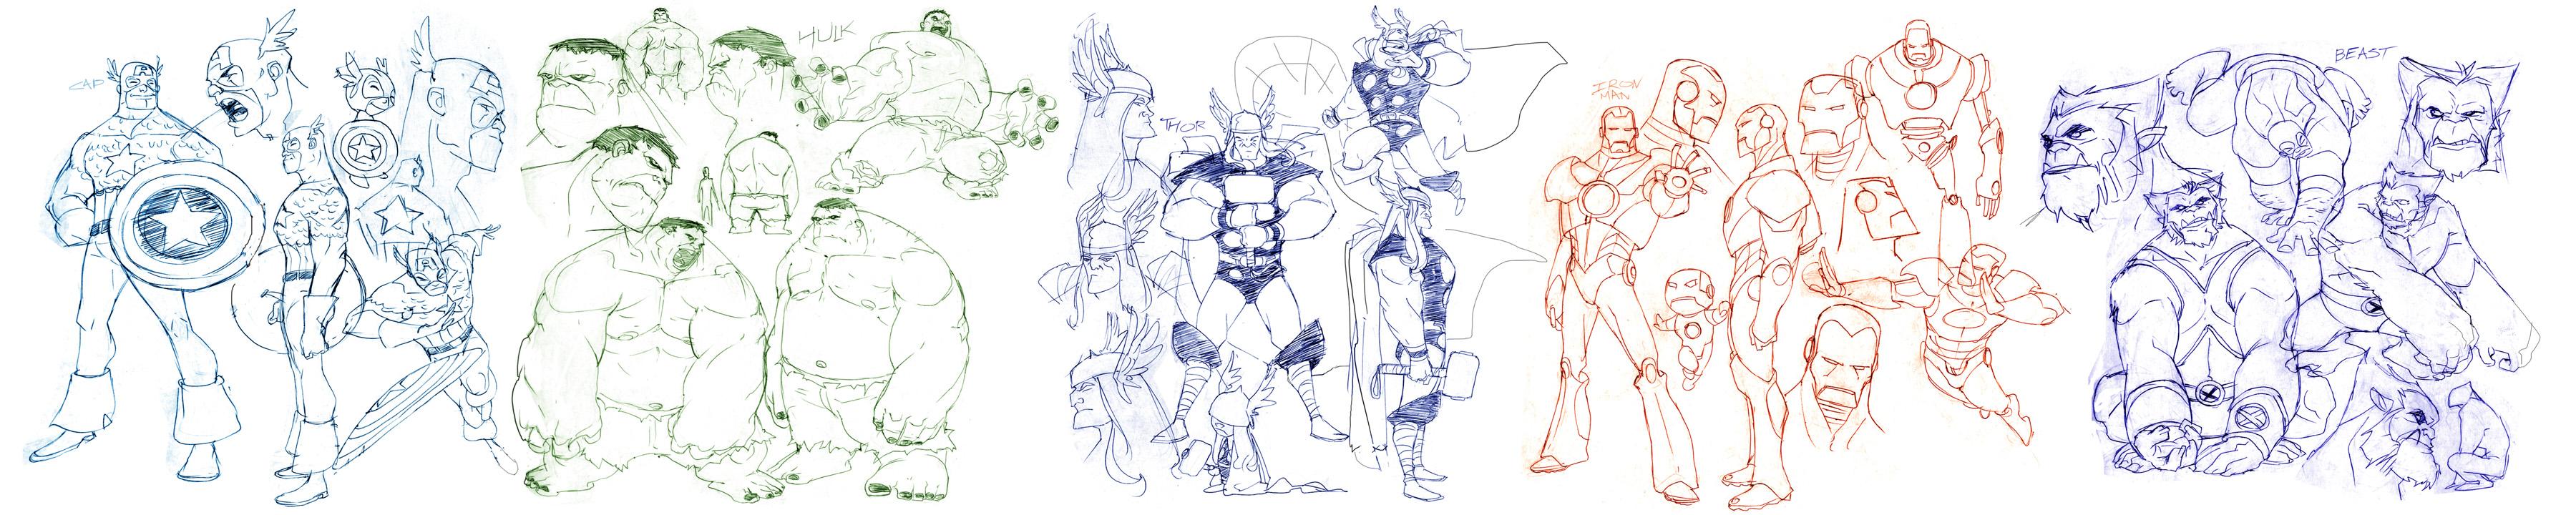 Marvel designs 3 by greenestreet